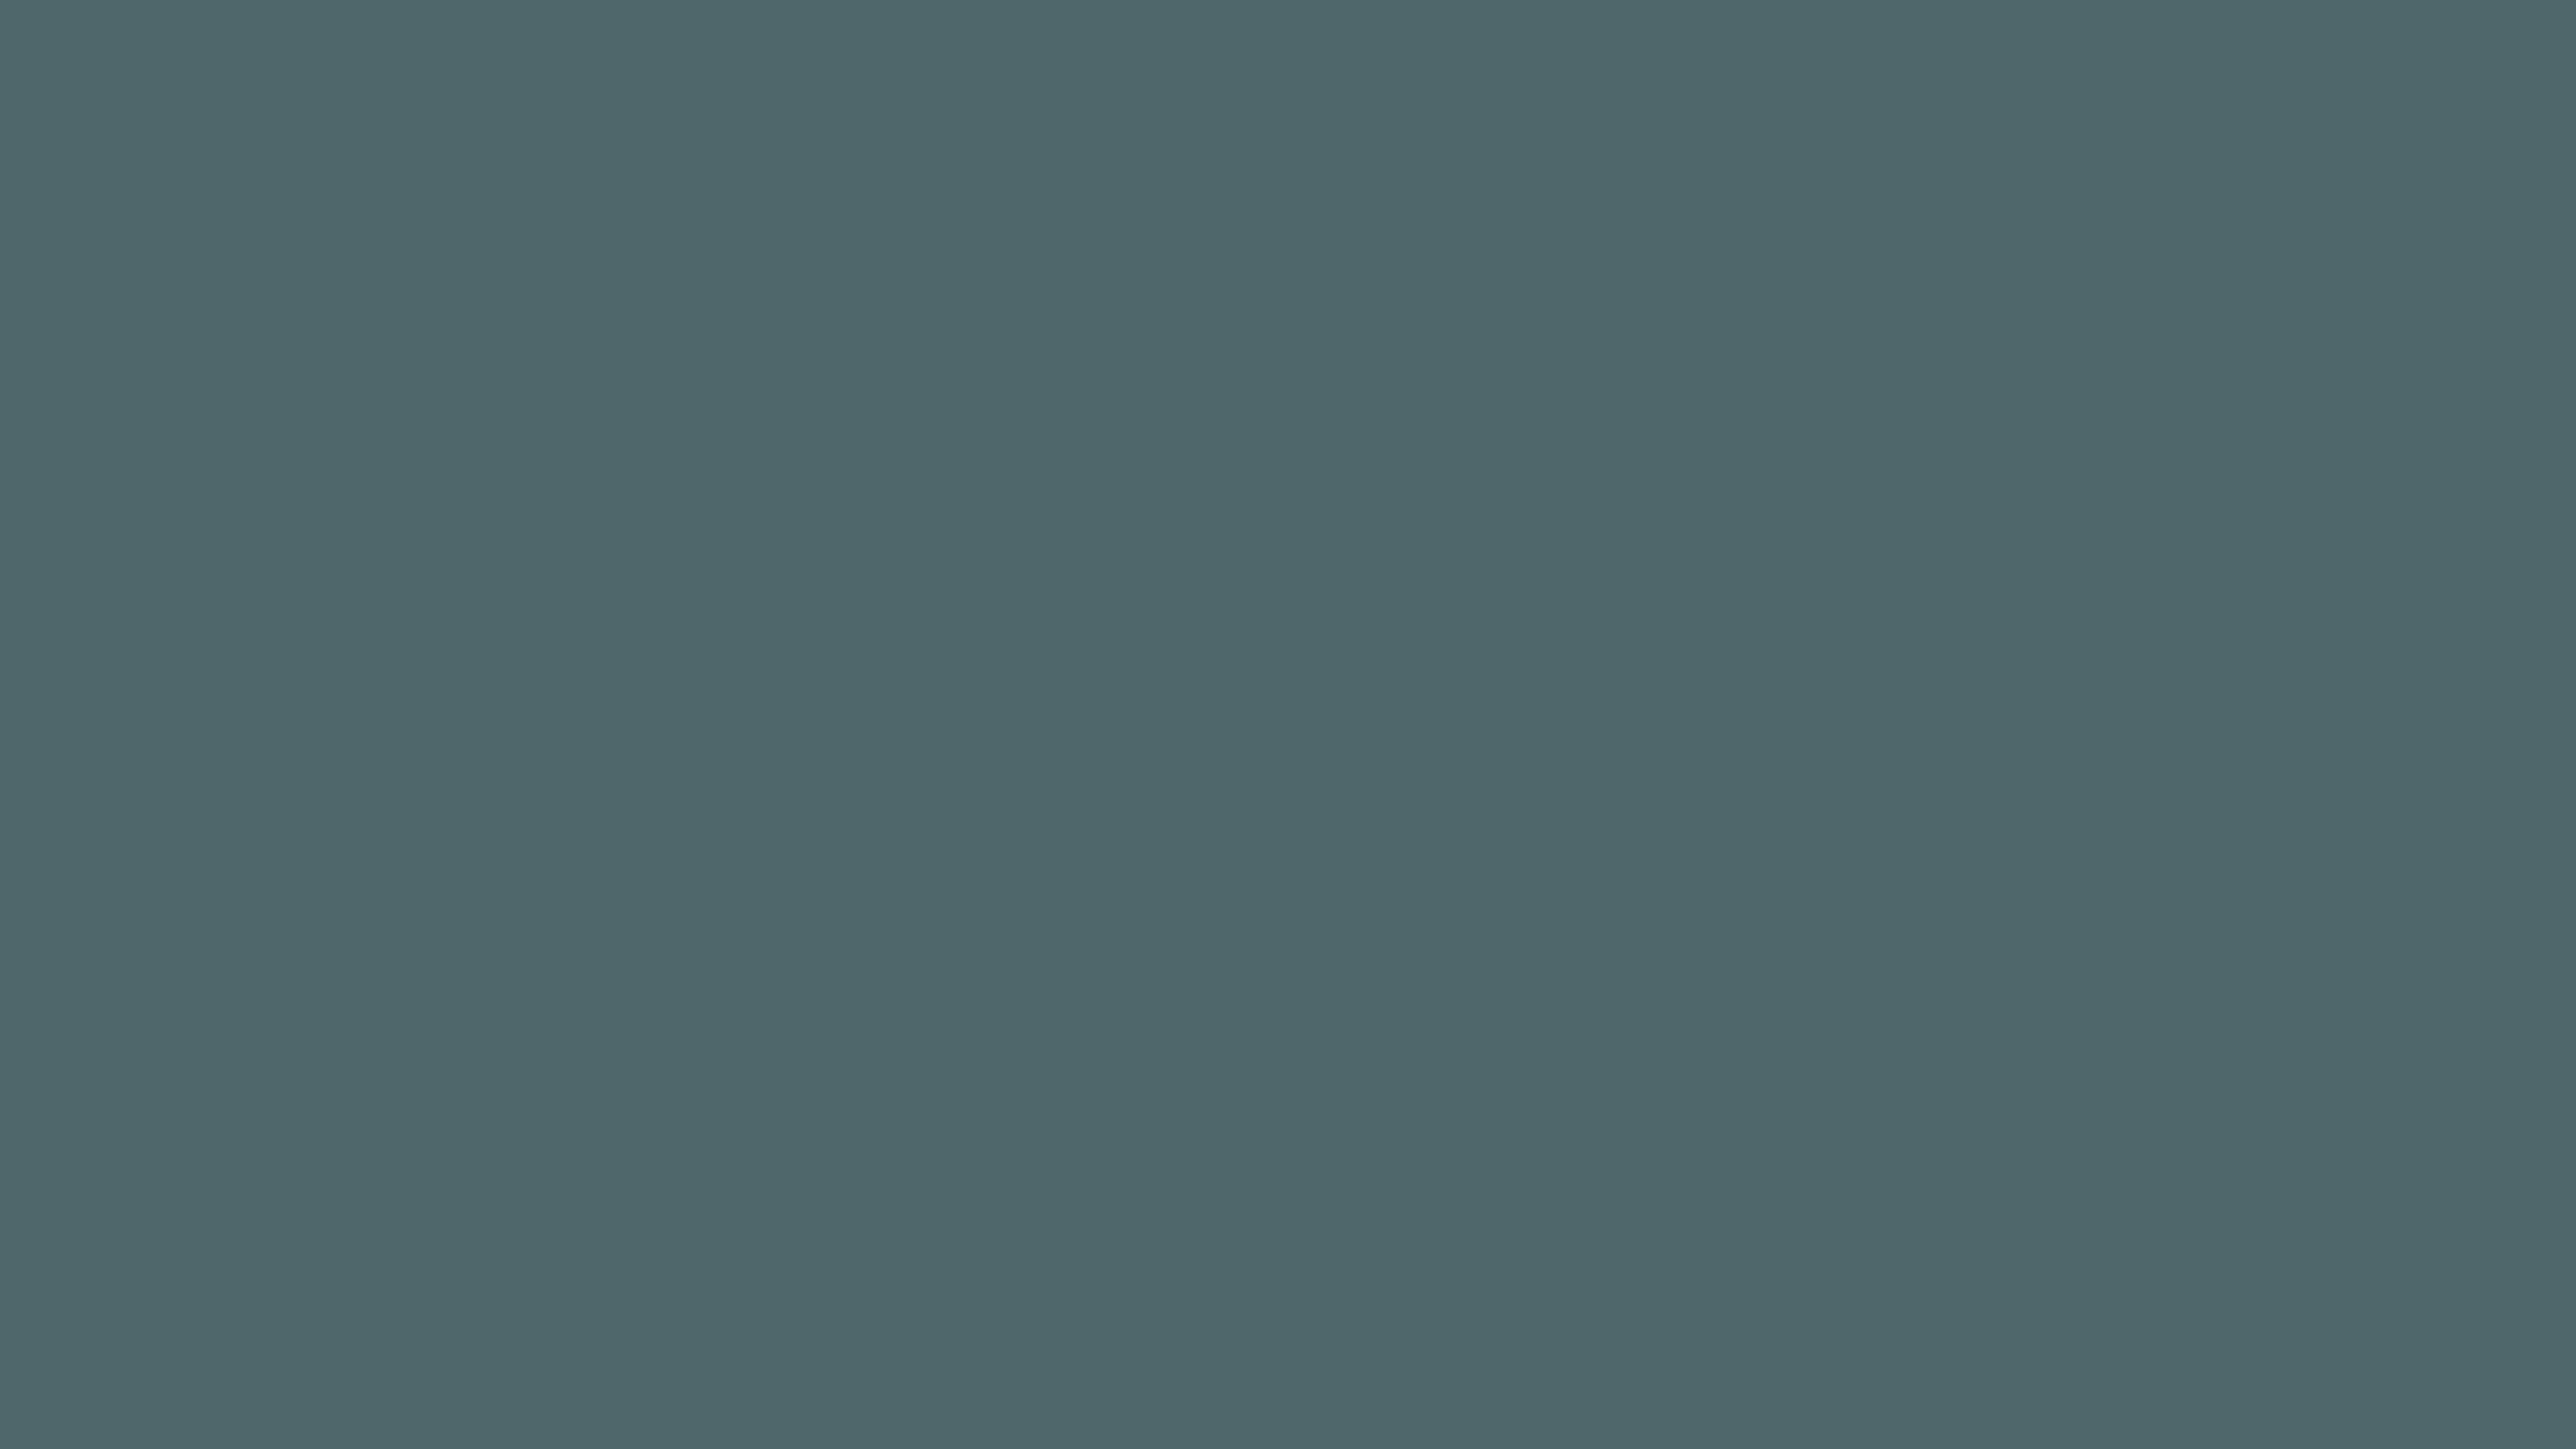 5120x2880 Stormcloud Solid Color Background